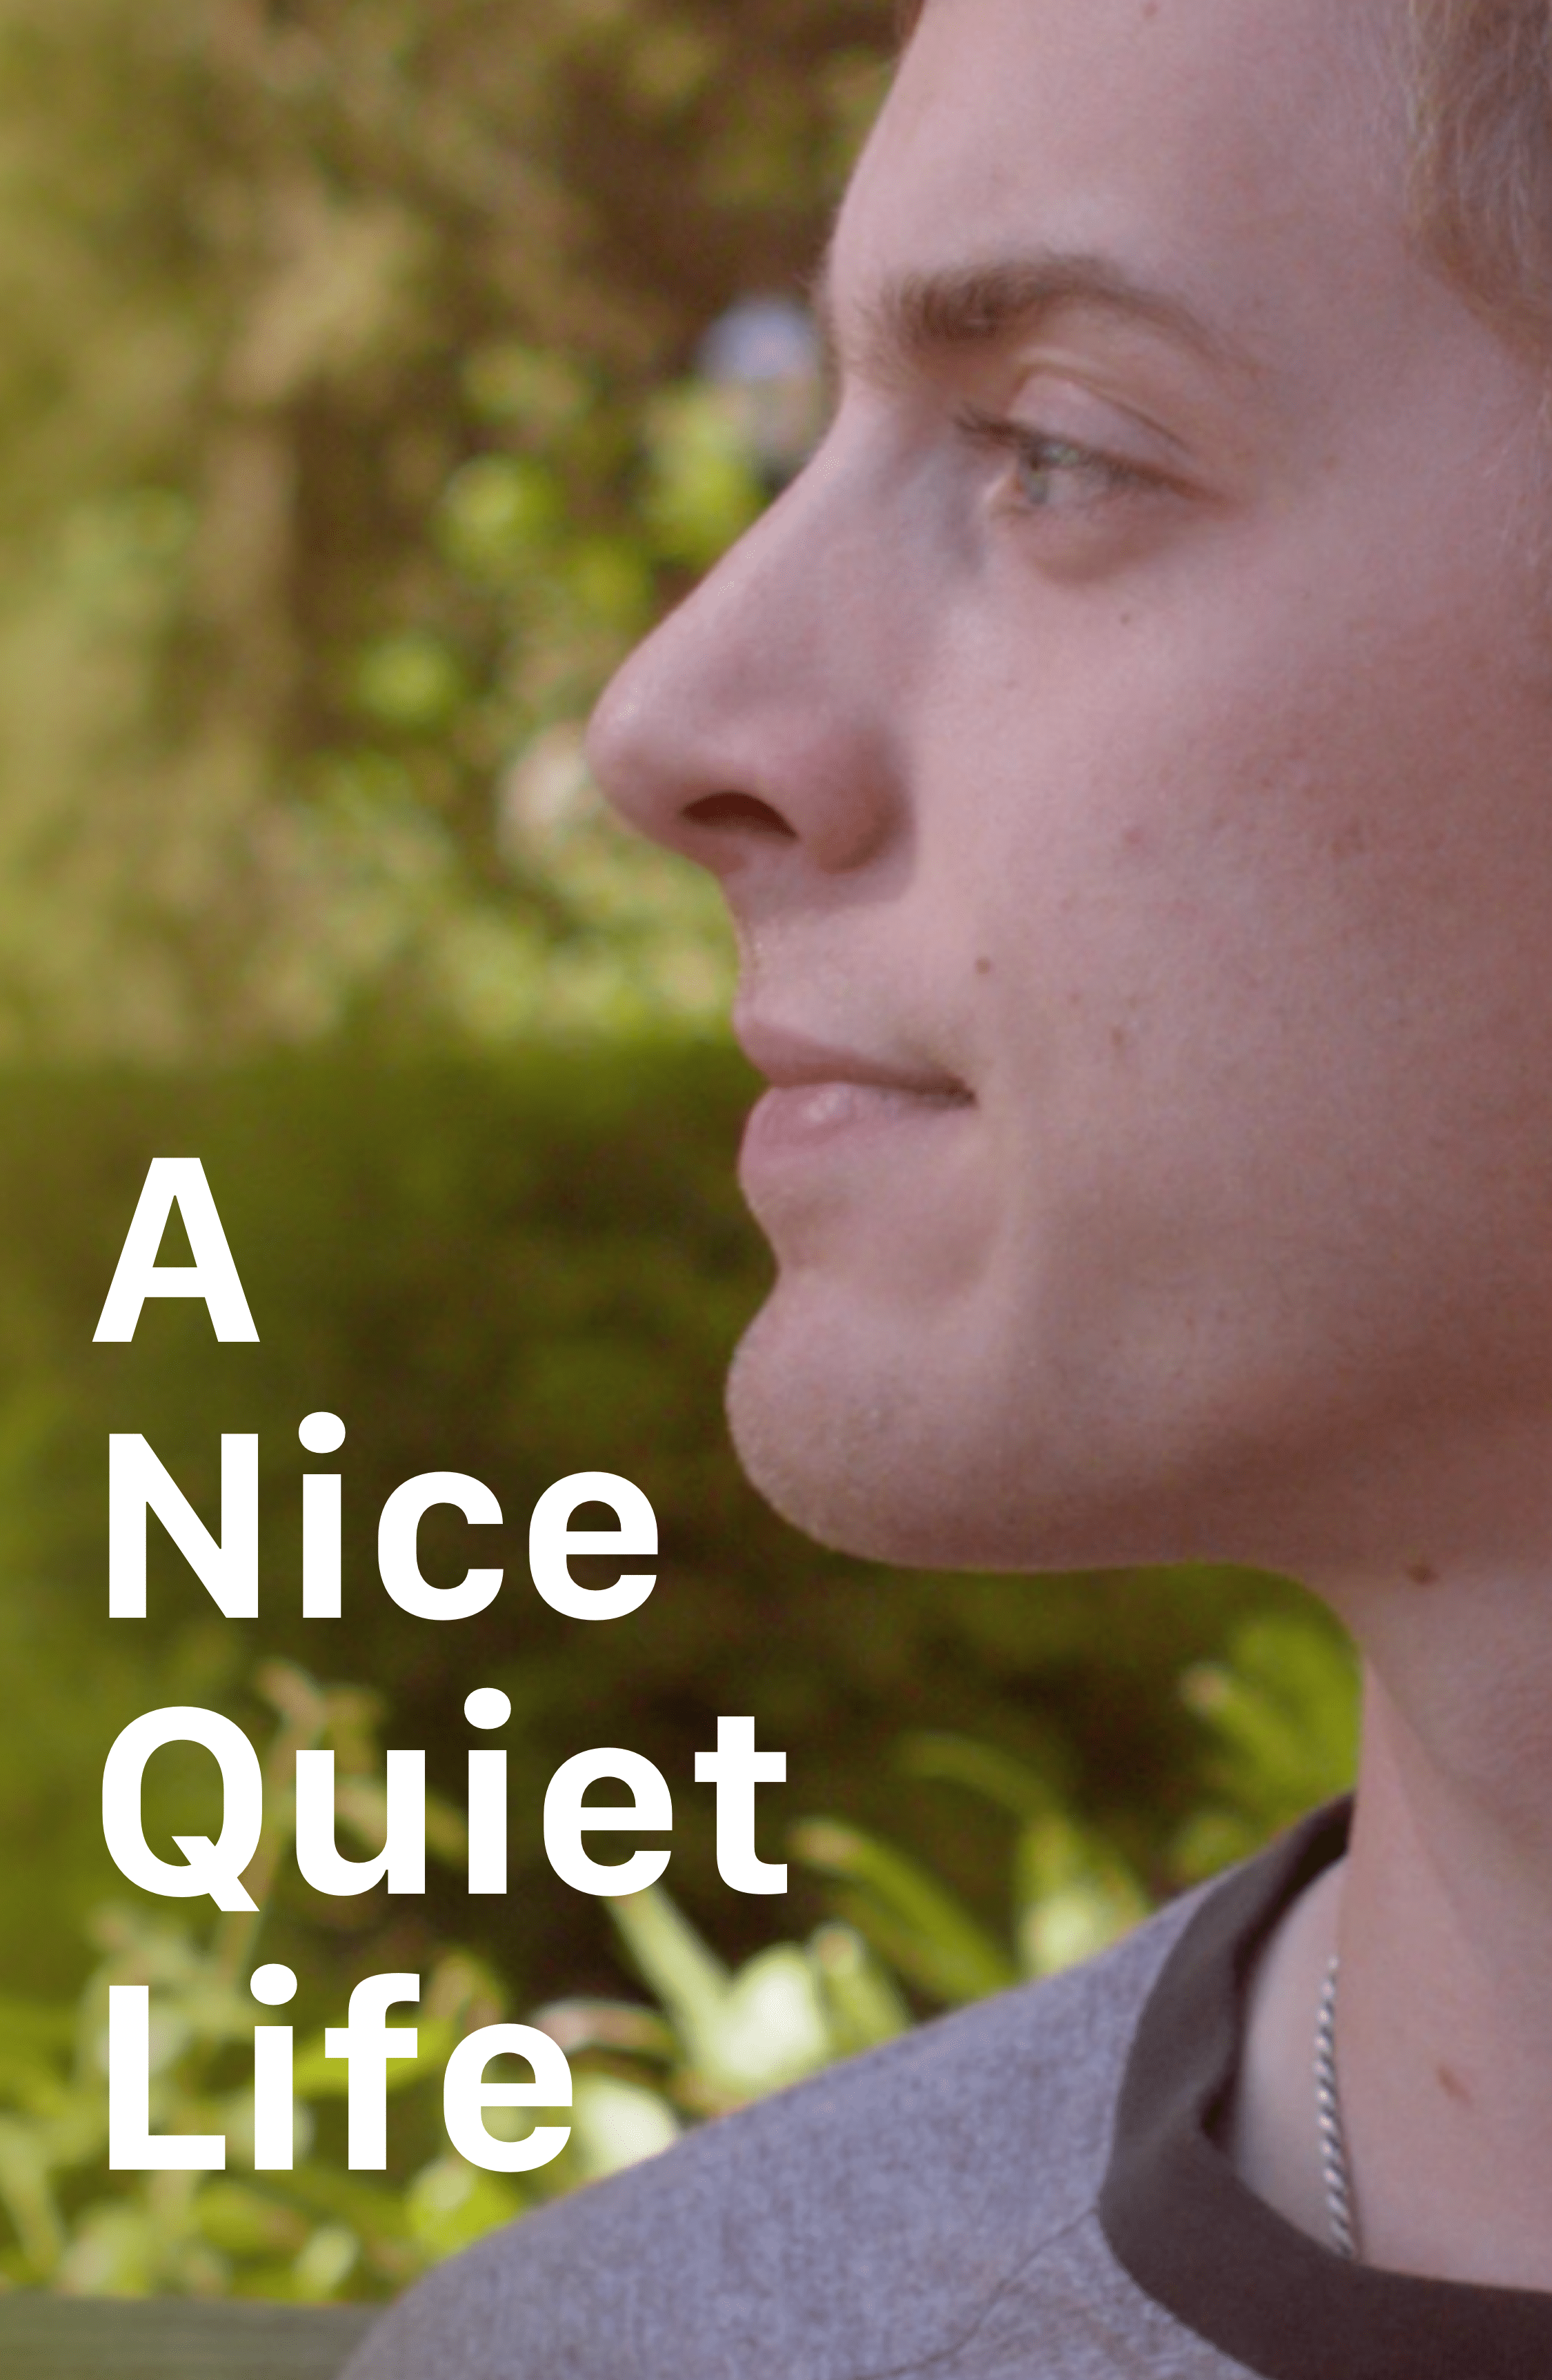 A Nice Quiet Life